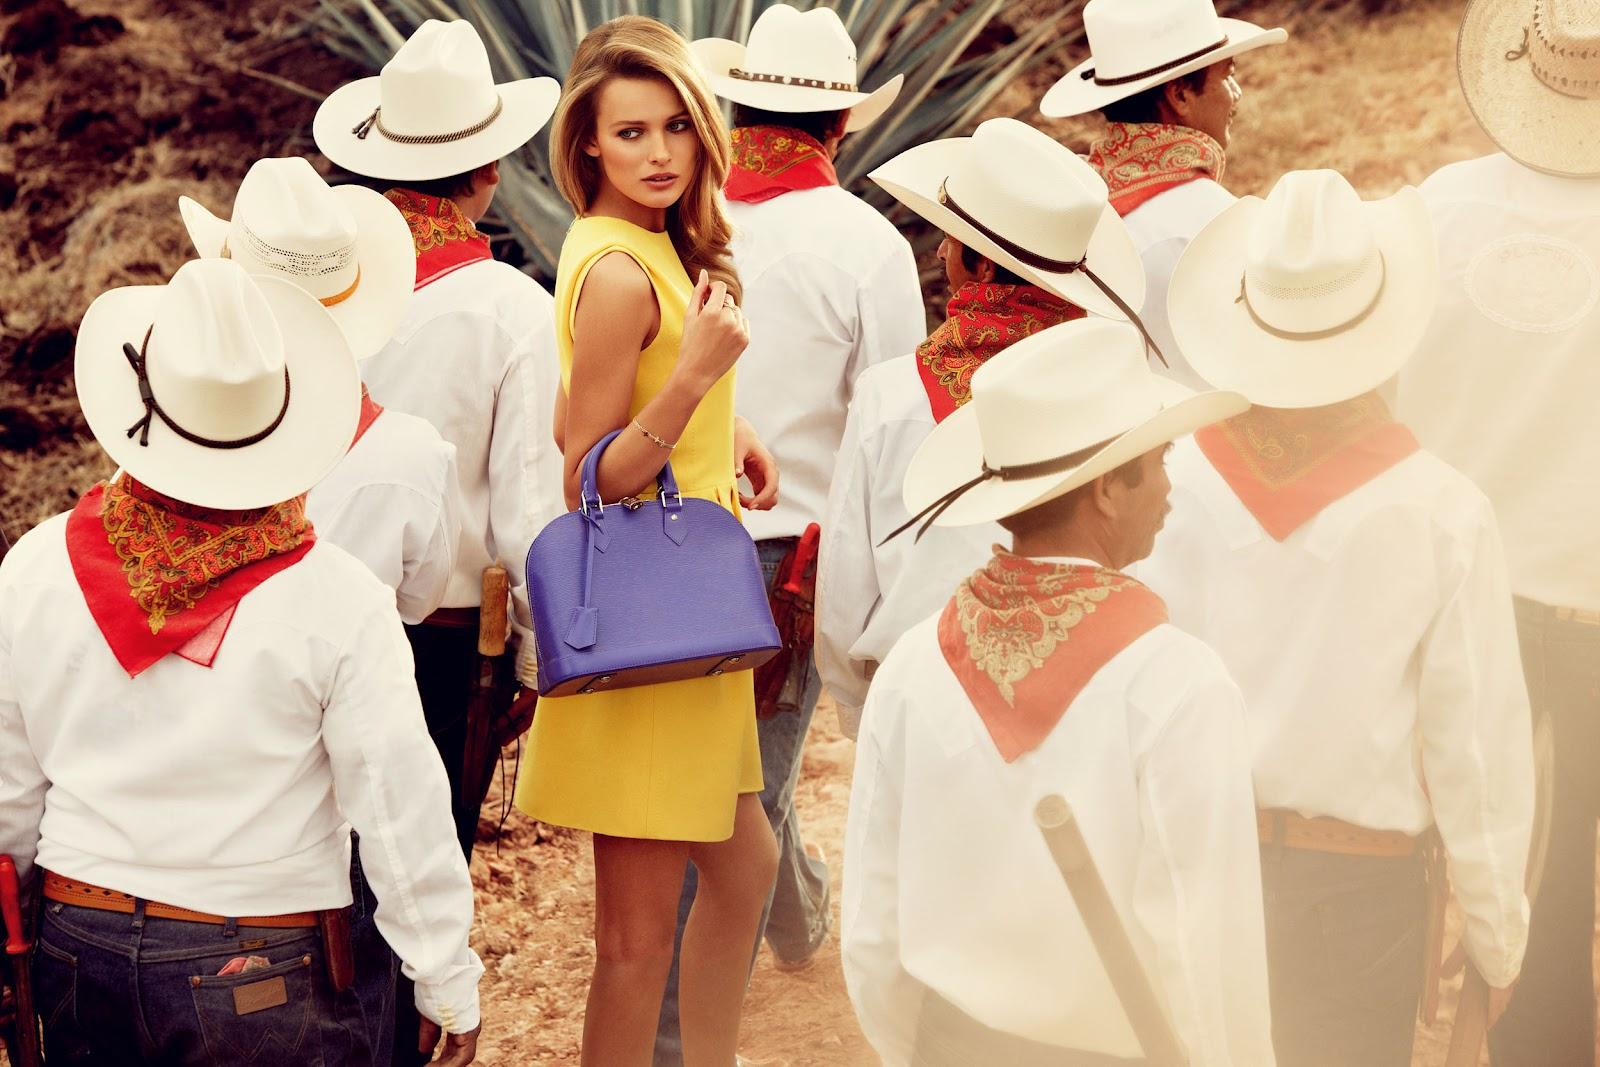 http://1.bp.blogspot.com/-fhkcvapIKfg/UFzEFYyIyoI/AAAAAAAAcos/zksqOrIgkPU/s1600/Edita+Vilkeviciute+by+Alexi+Lubomirski+%2528A+Mexican+Road+Trip+-+Louis+Vuitton+Travel+Fall+2012%2529.jpg